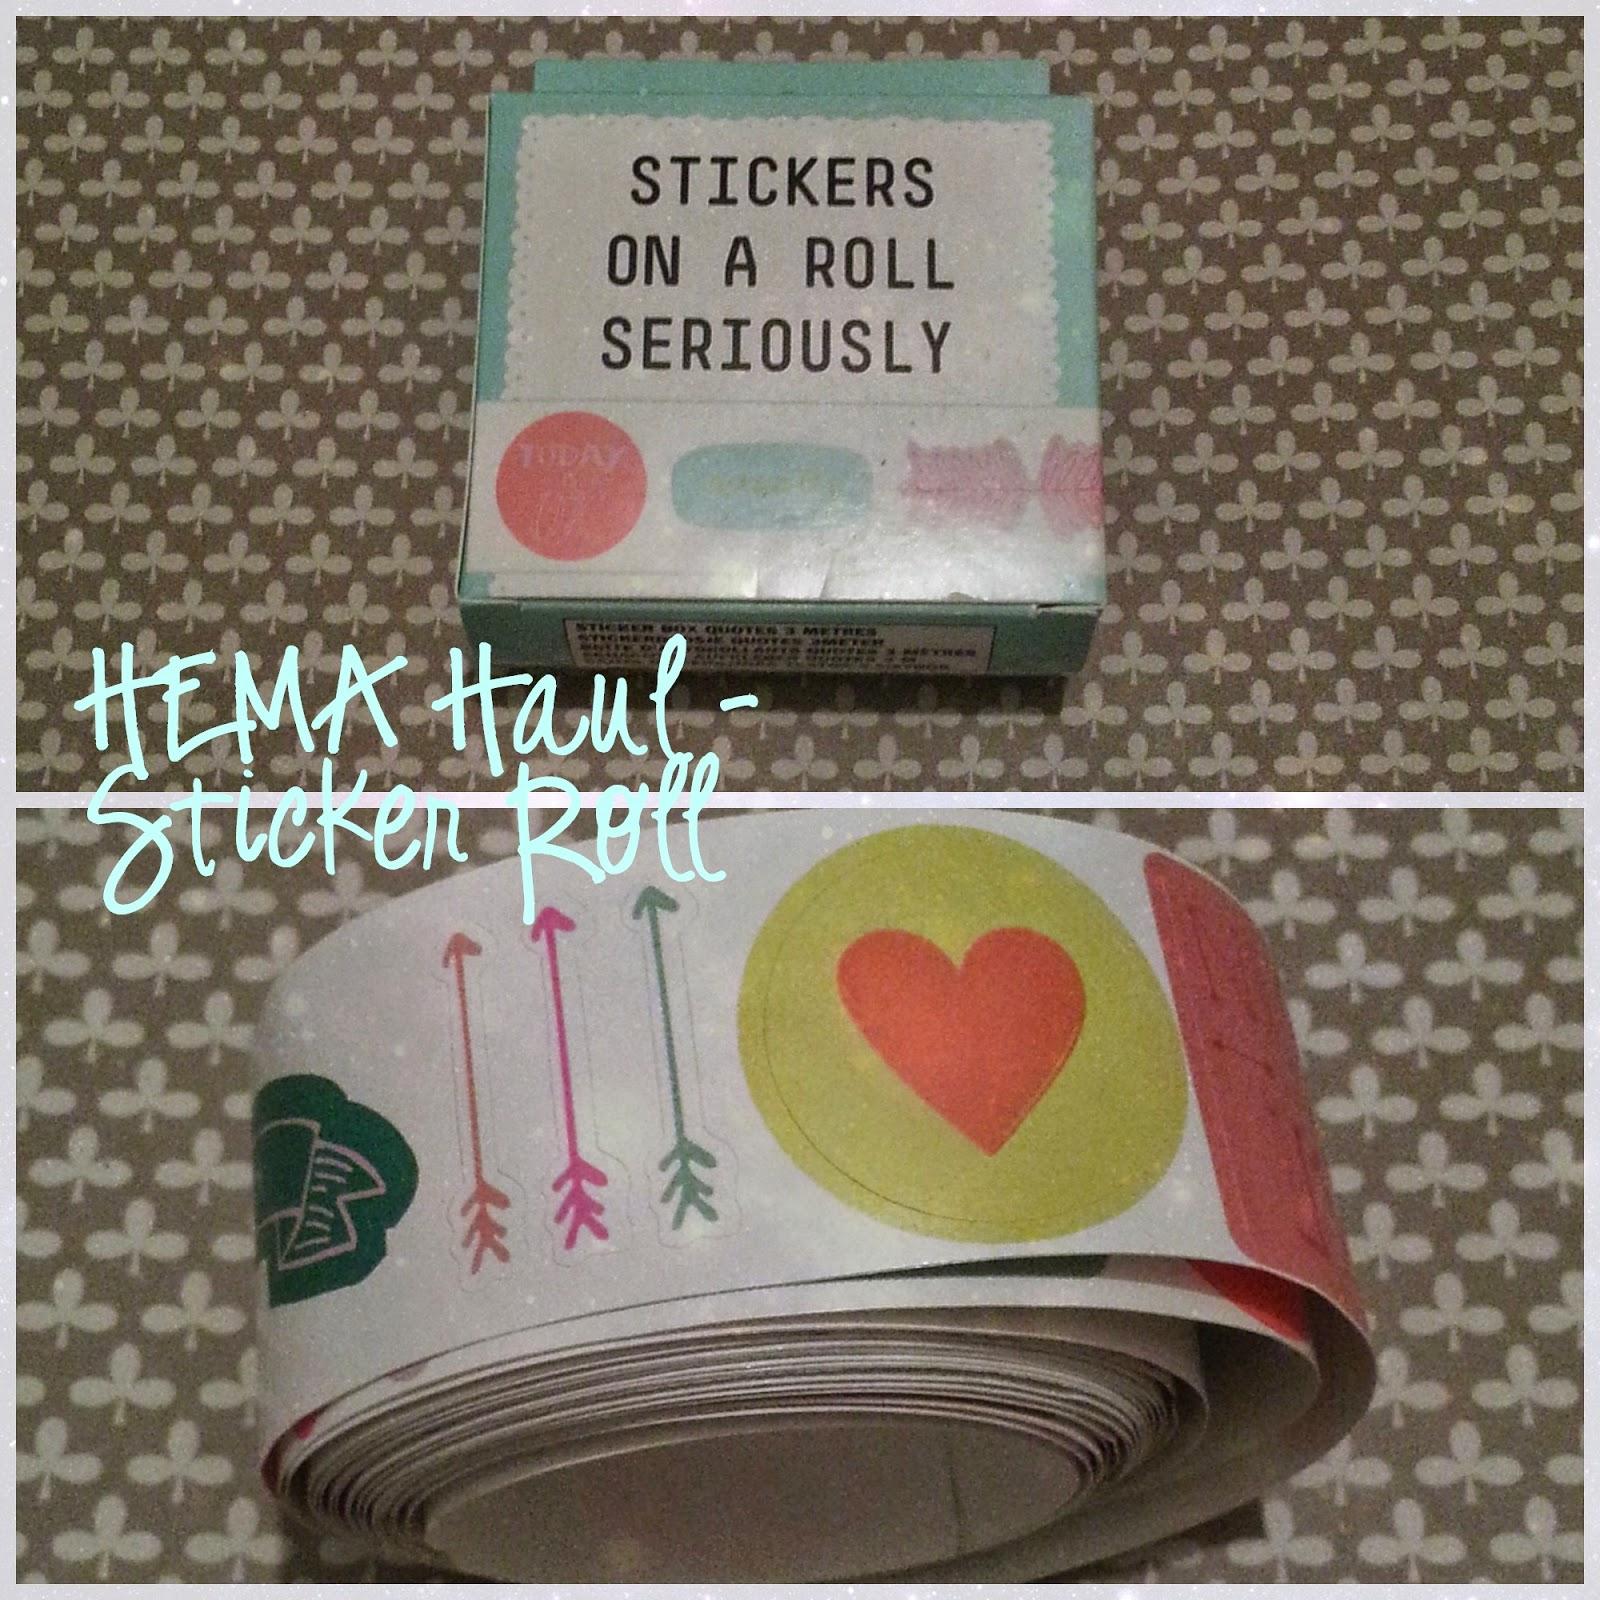 HEMA sticker roll